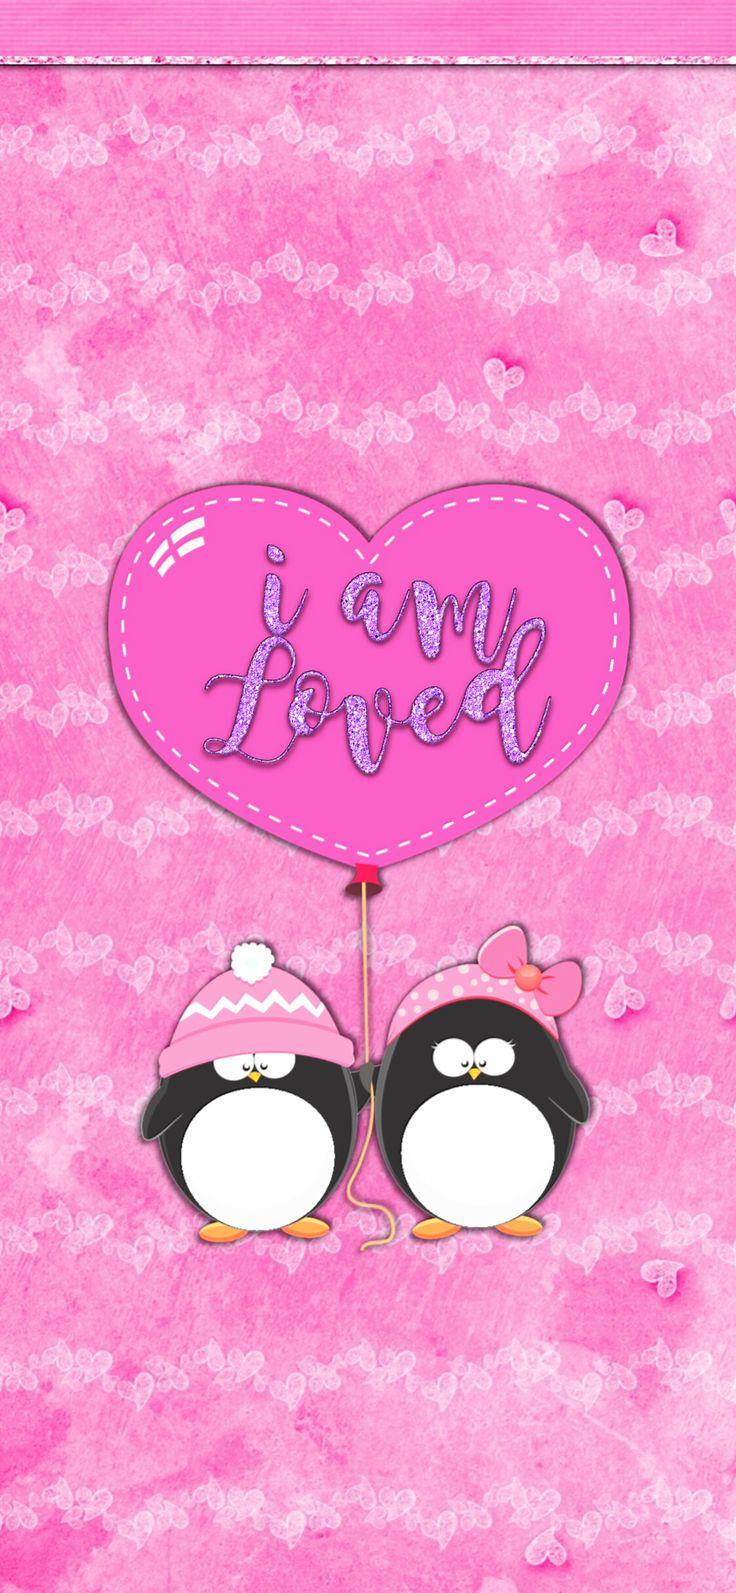 iPhone X version Penguin love, Love wallpaper, Winter